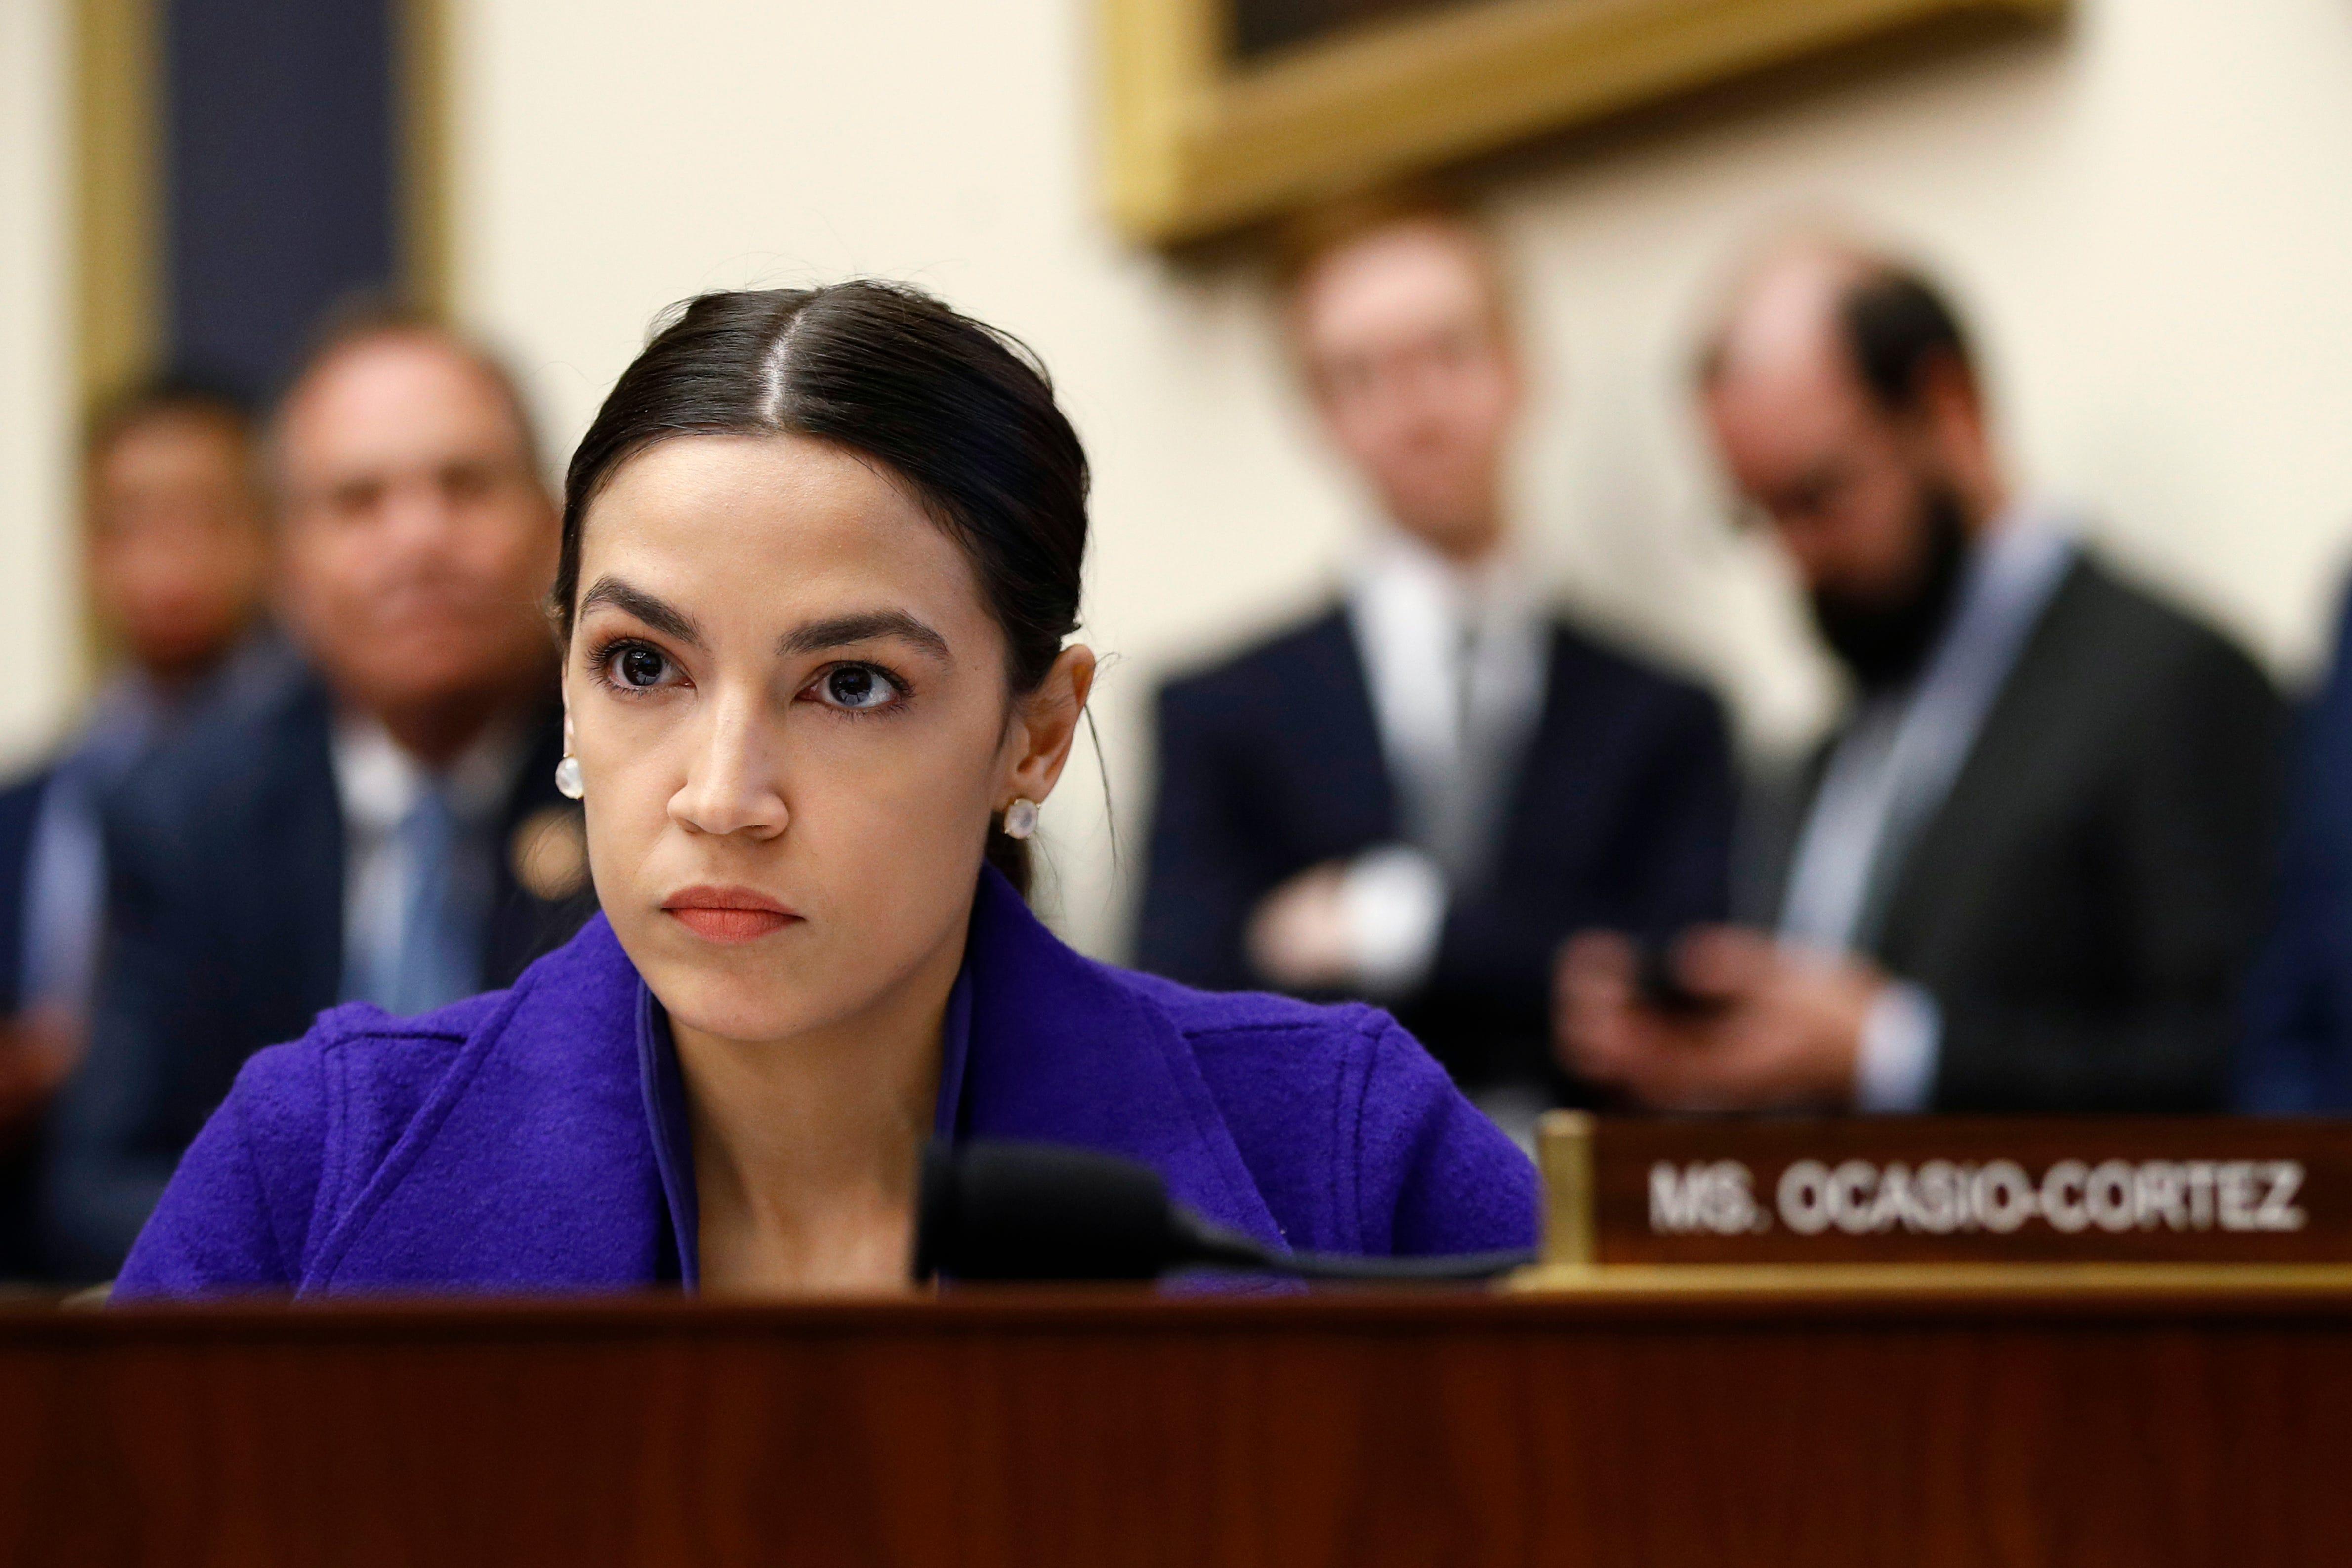 Rep. Alexandria Ocasio-Cortez says Joe Biden run in 2020 election doesn't 'animate me'